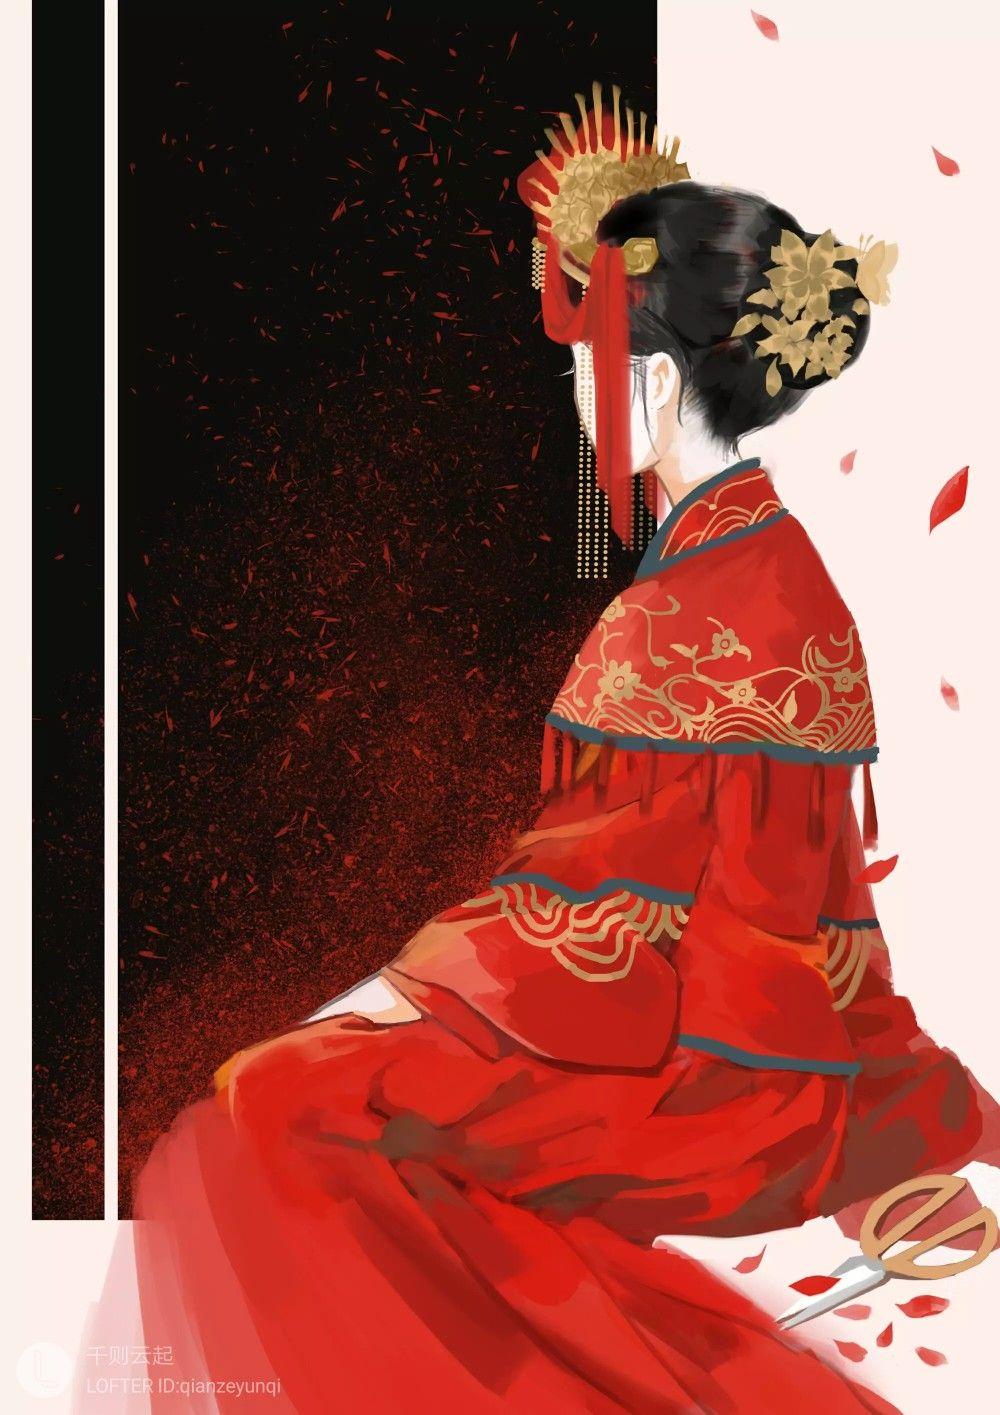 mnizoe184 Cre On pic trong 2020 Anime, Nghệ thuật cổ